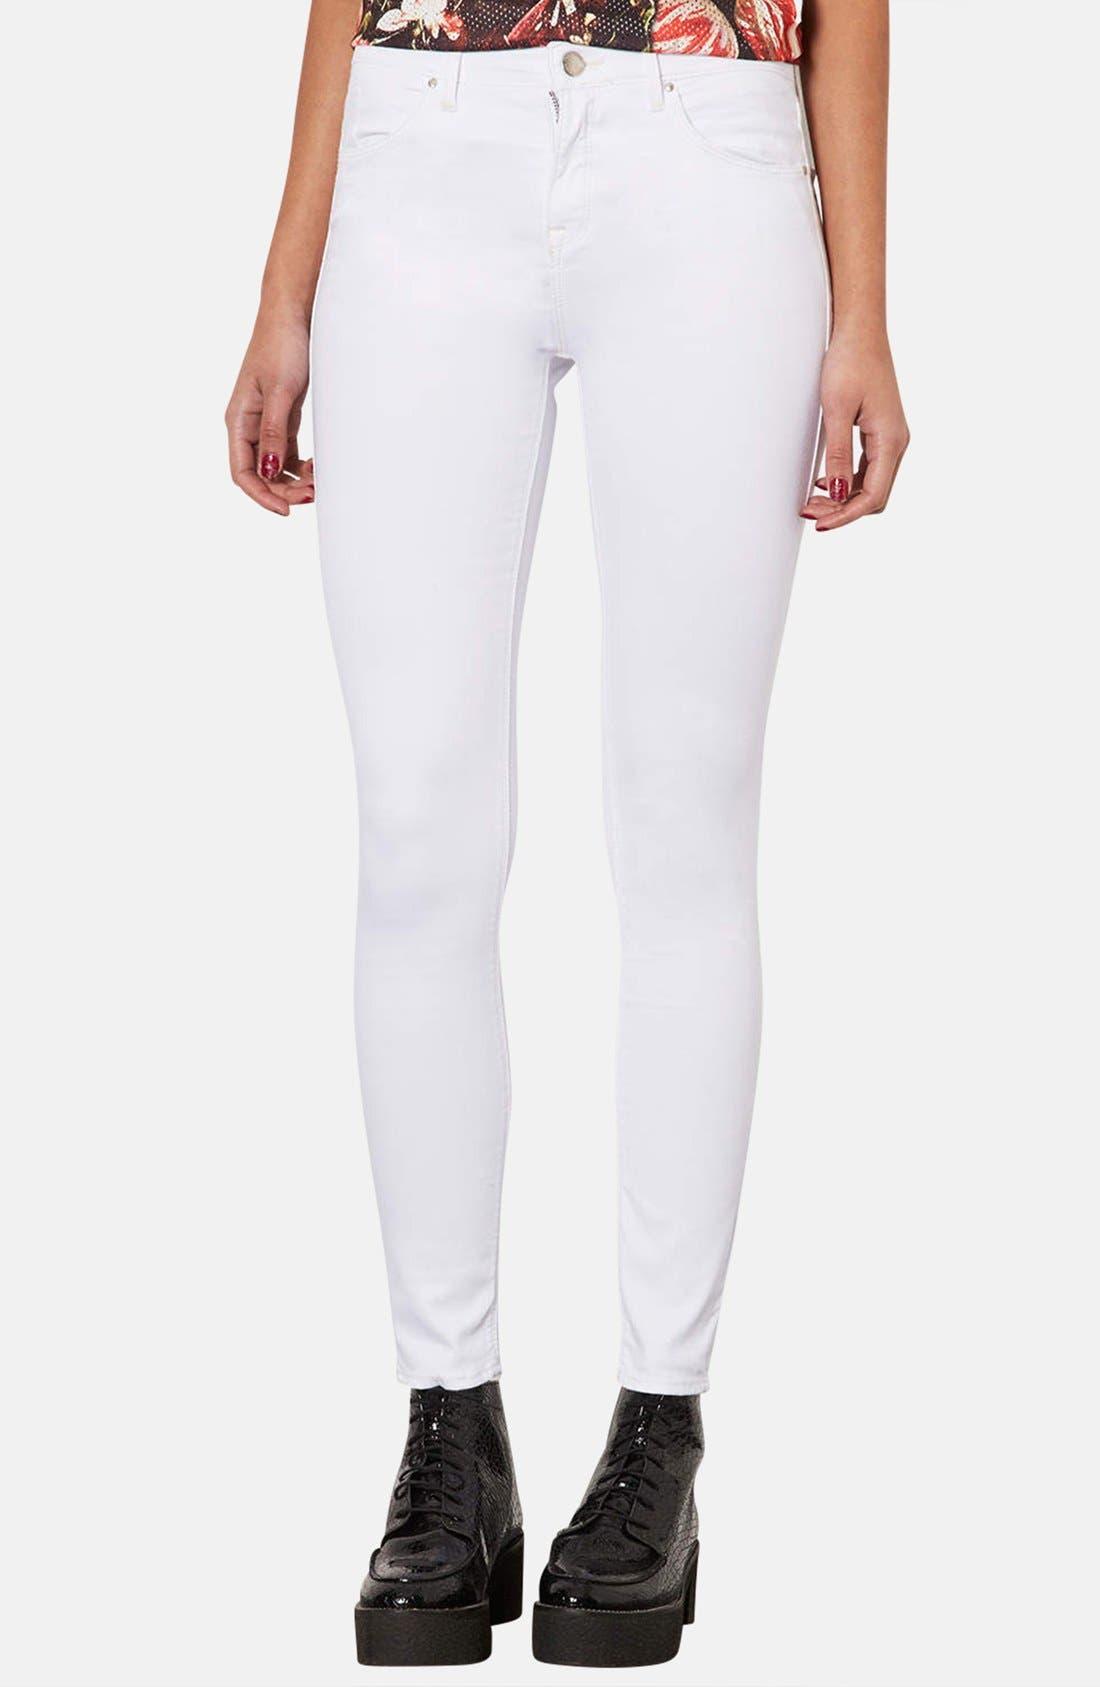 Alternate Image 1 Selected - Topshop Moto 'Leigh' Skinny Jeans (Regular & Short)